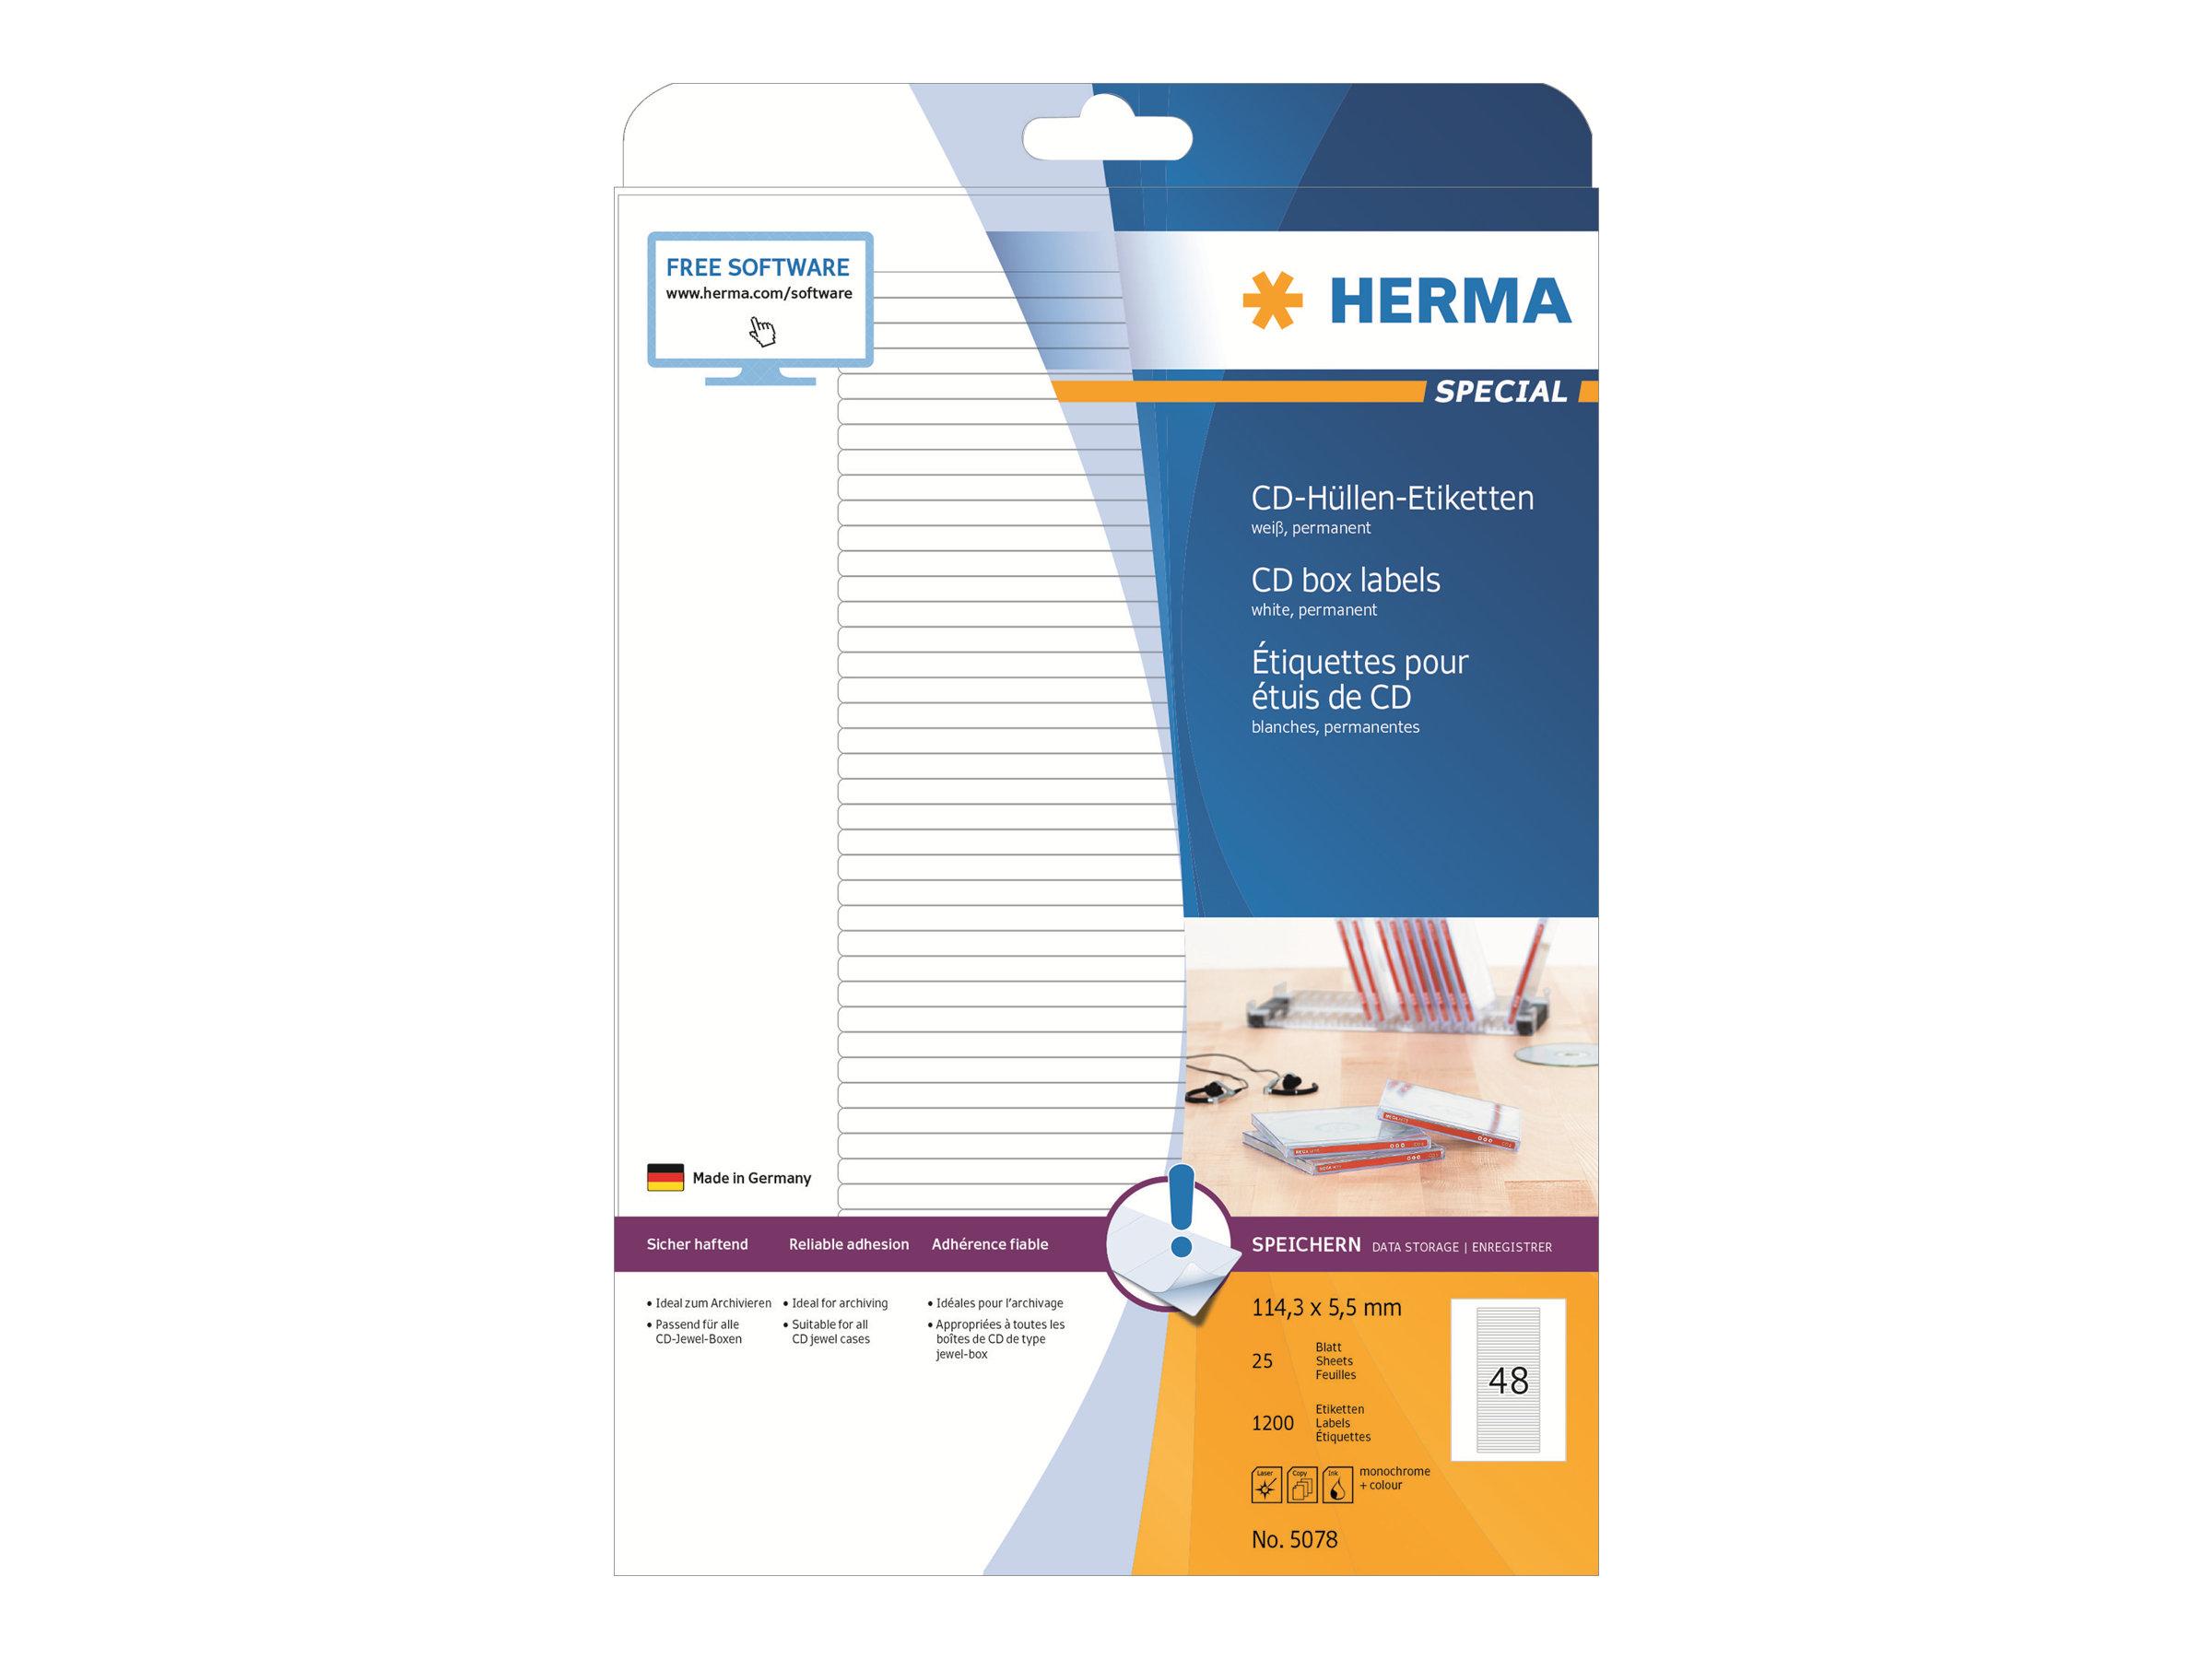 HERMA Special - Papier - matt - permanent selbstklebend - weiß - 114.3 x 5.5 mm 1200 Etikett(en) (25 Bogen x 48)